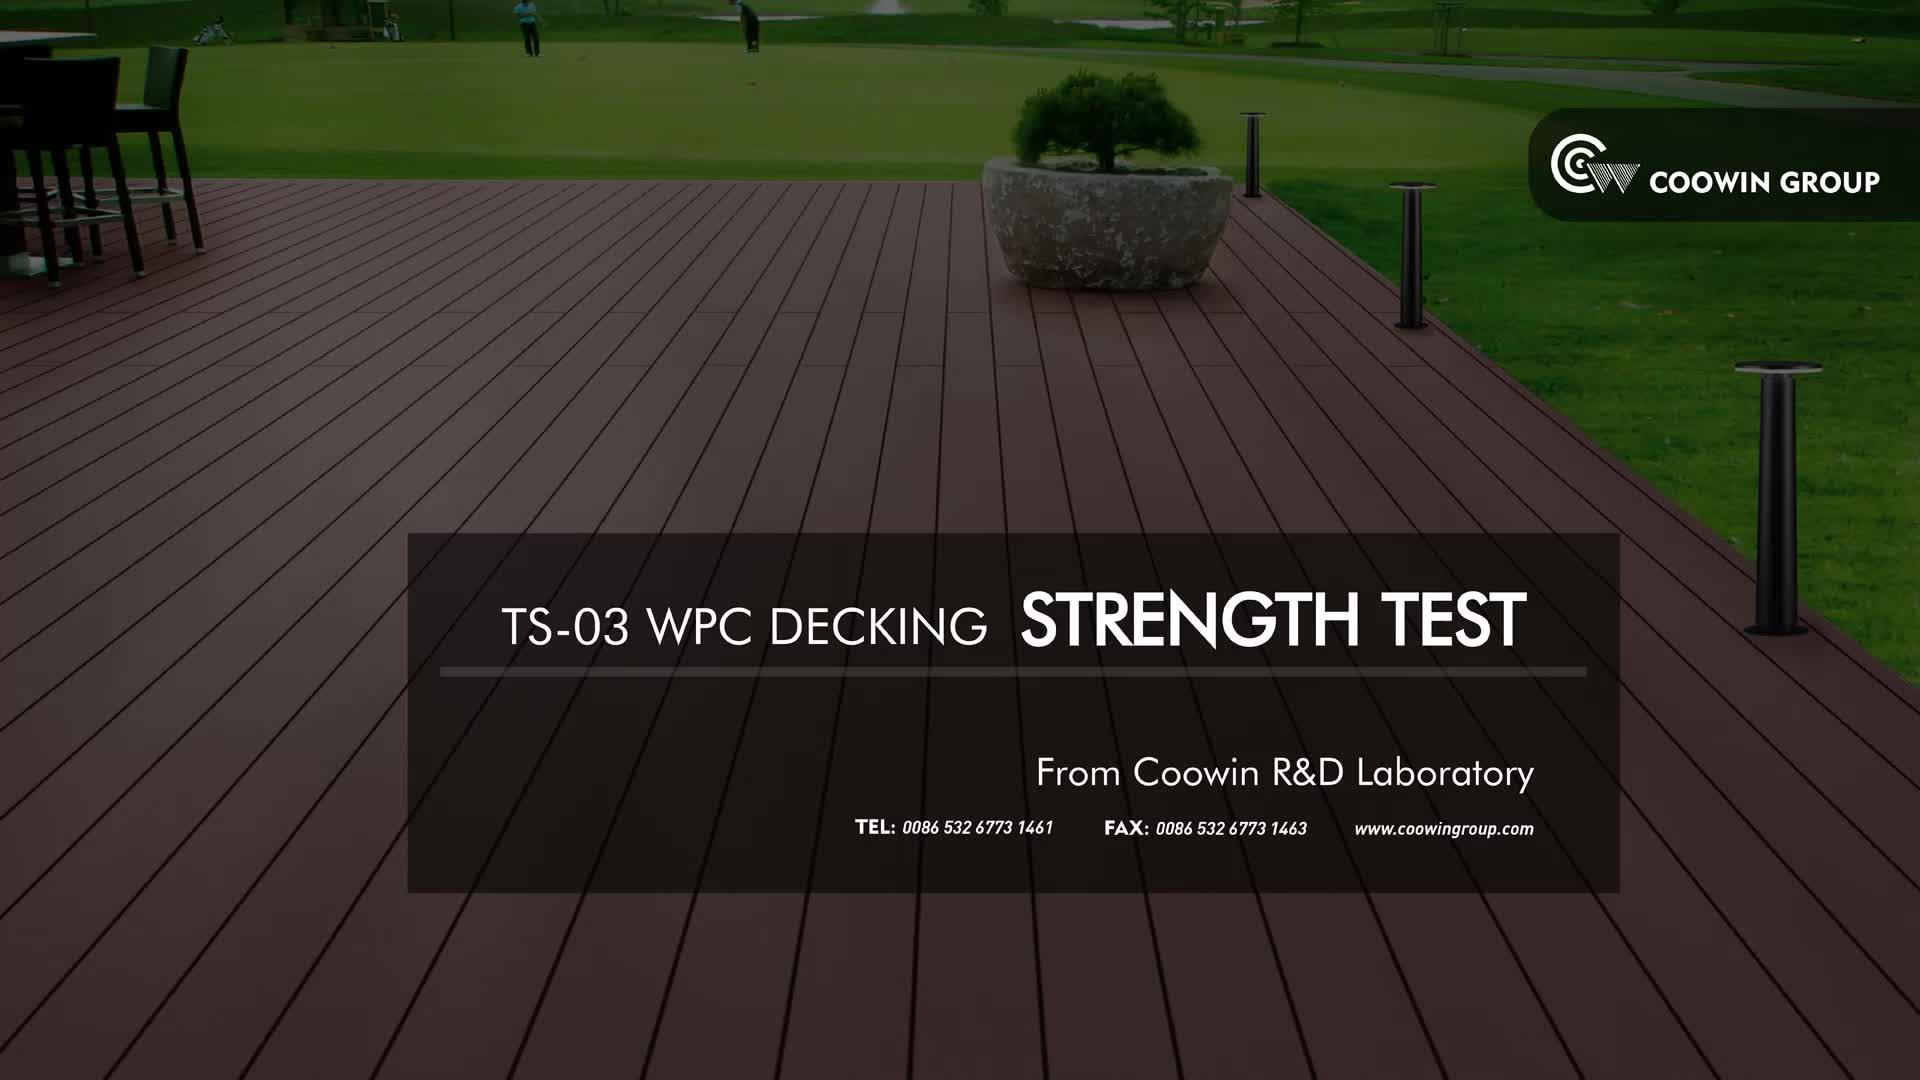 wpc test elegant wpc diele im test gefroren with wpc. Black Bedroom Furniture Sets. Home Design Ideas